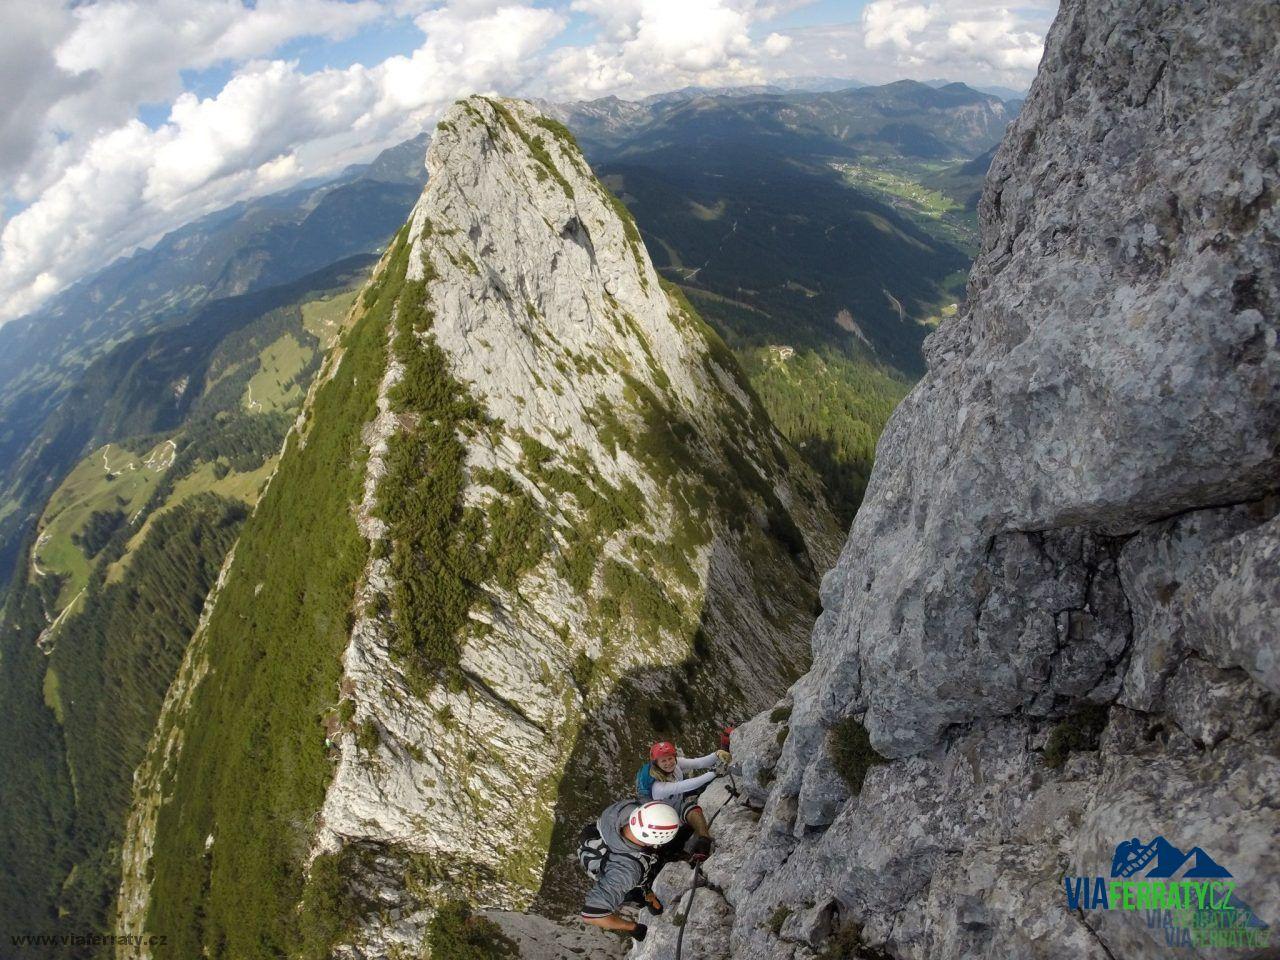 Klettersteigset Intersport : Klettersteigset intersport: klettersteig intersport grünstein